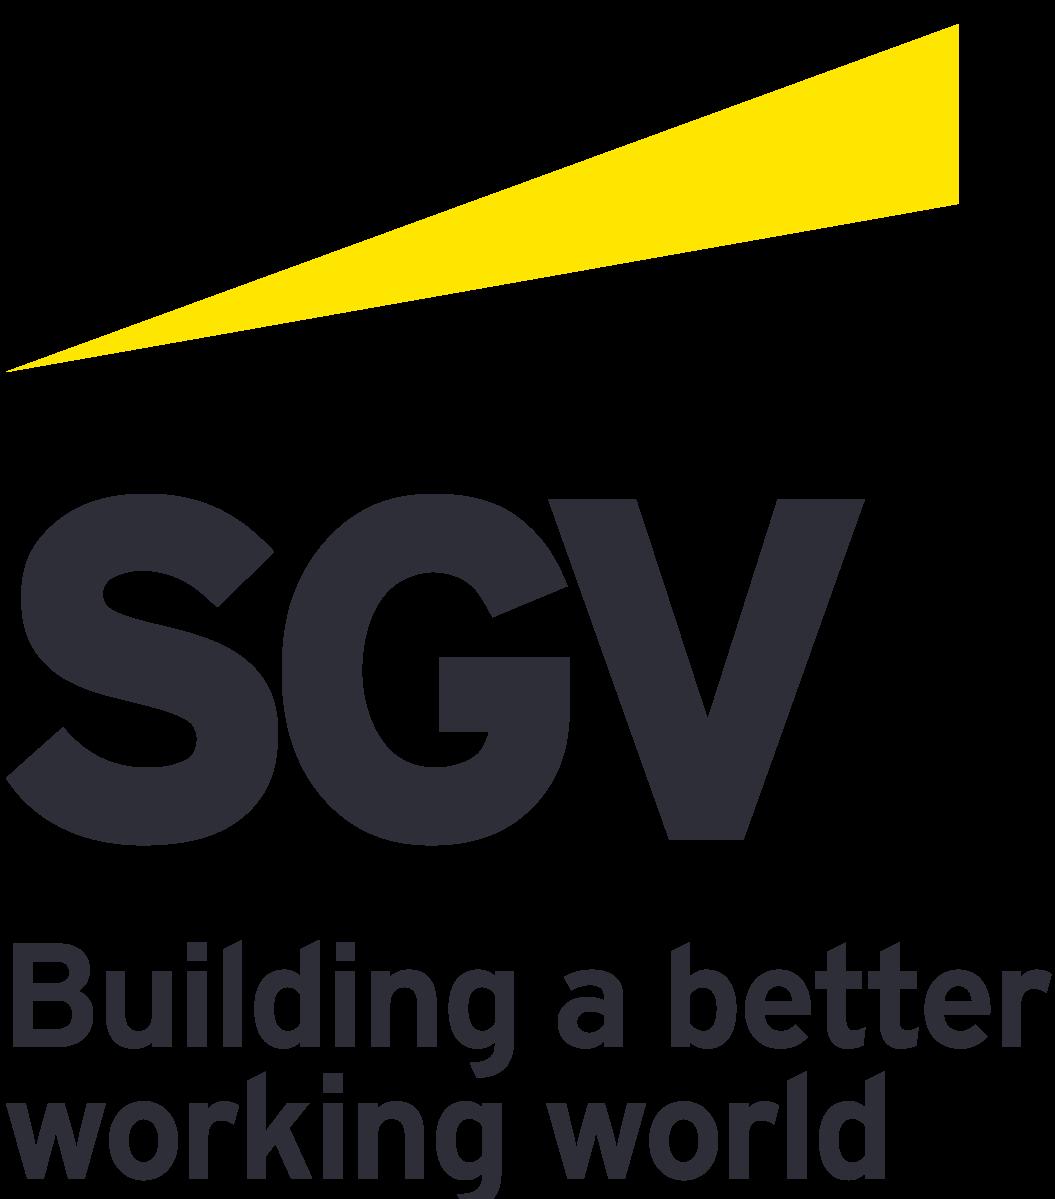 SGV logo (new) Off Black